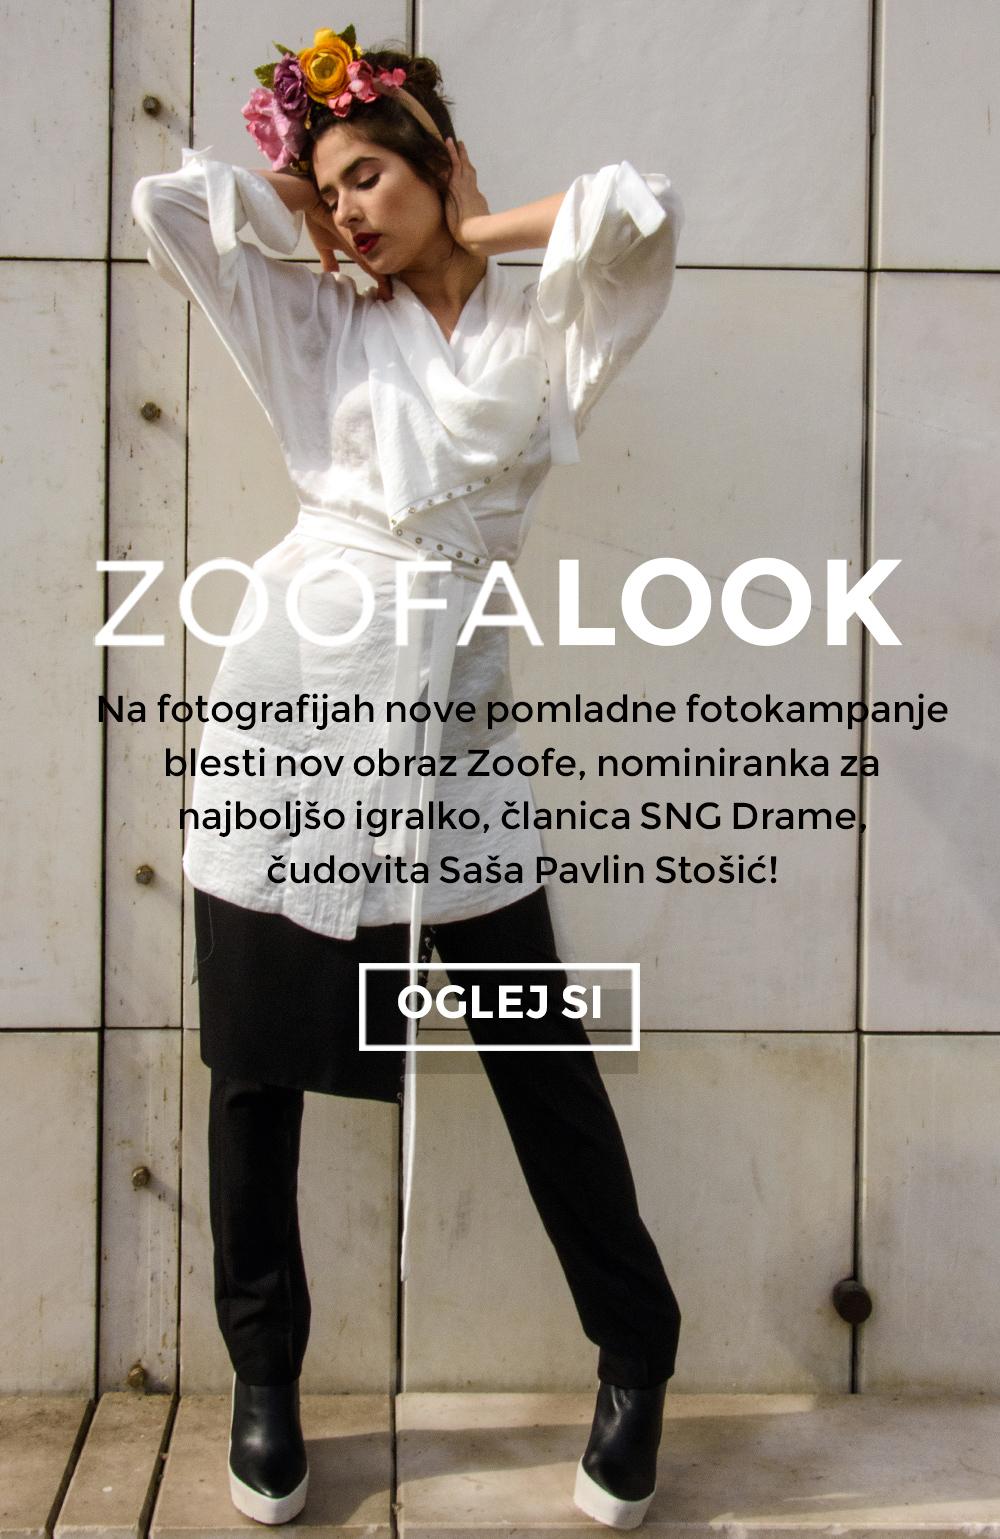 zoofalook-pomlad-2.jpg